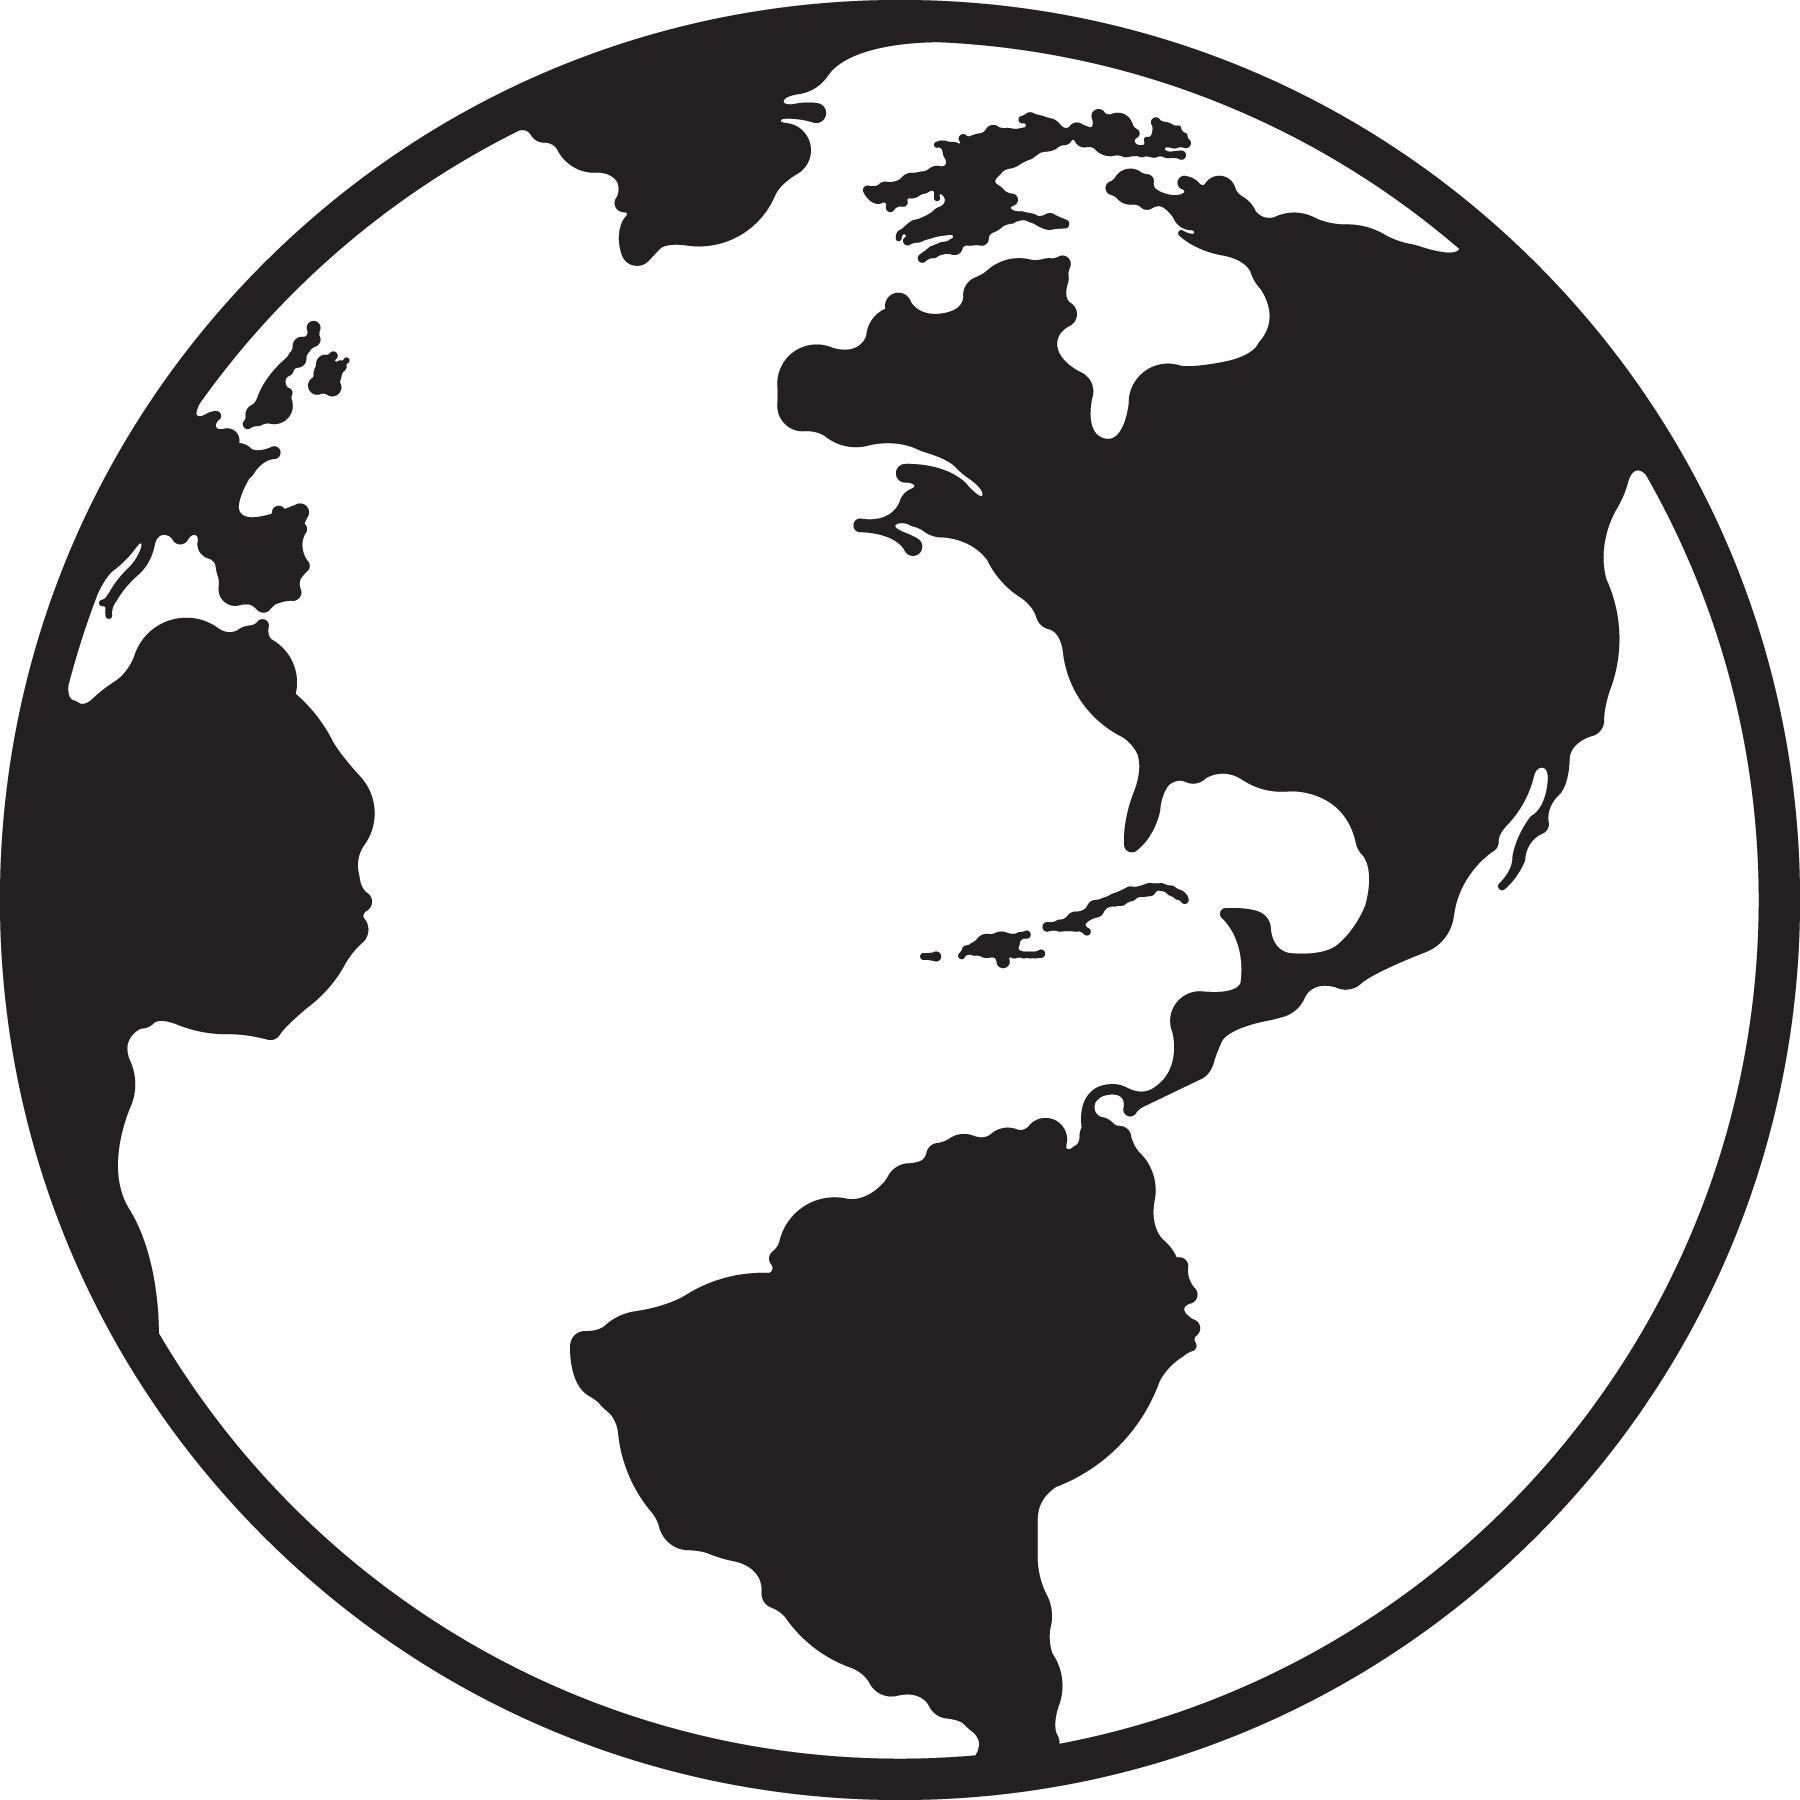 Globe Clipart Black And White In 2021 Clipart Black And White Globe Clipart Clip Art